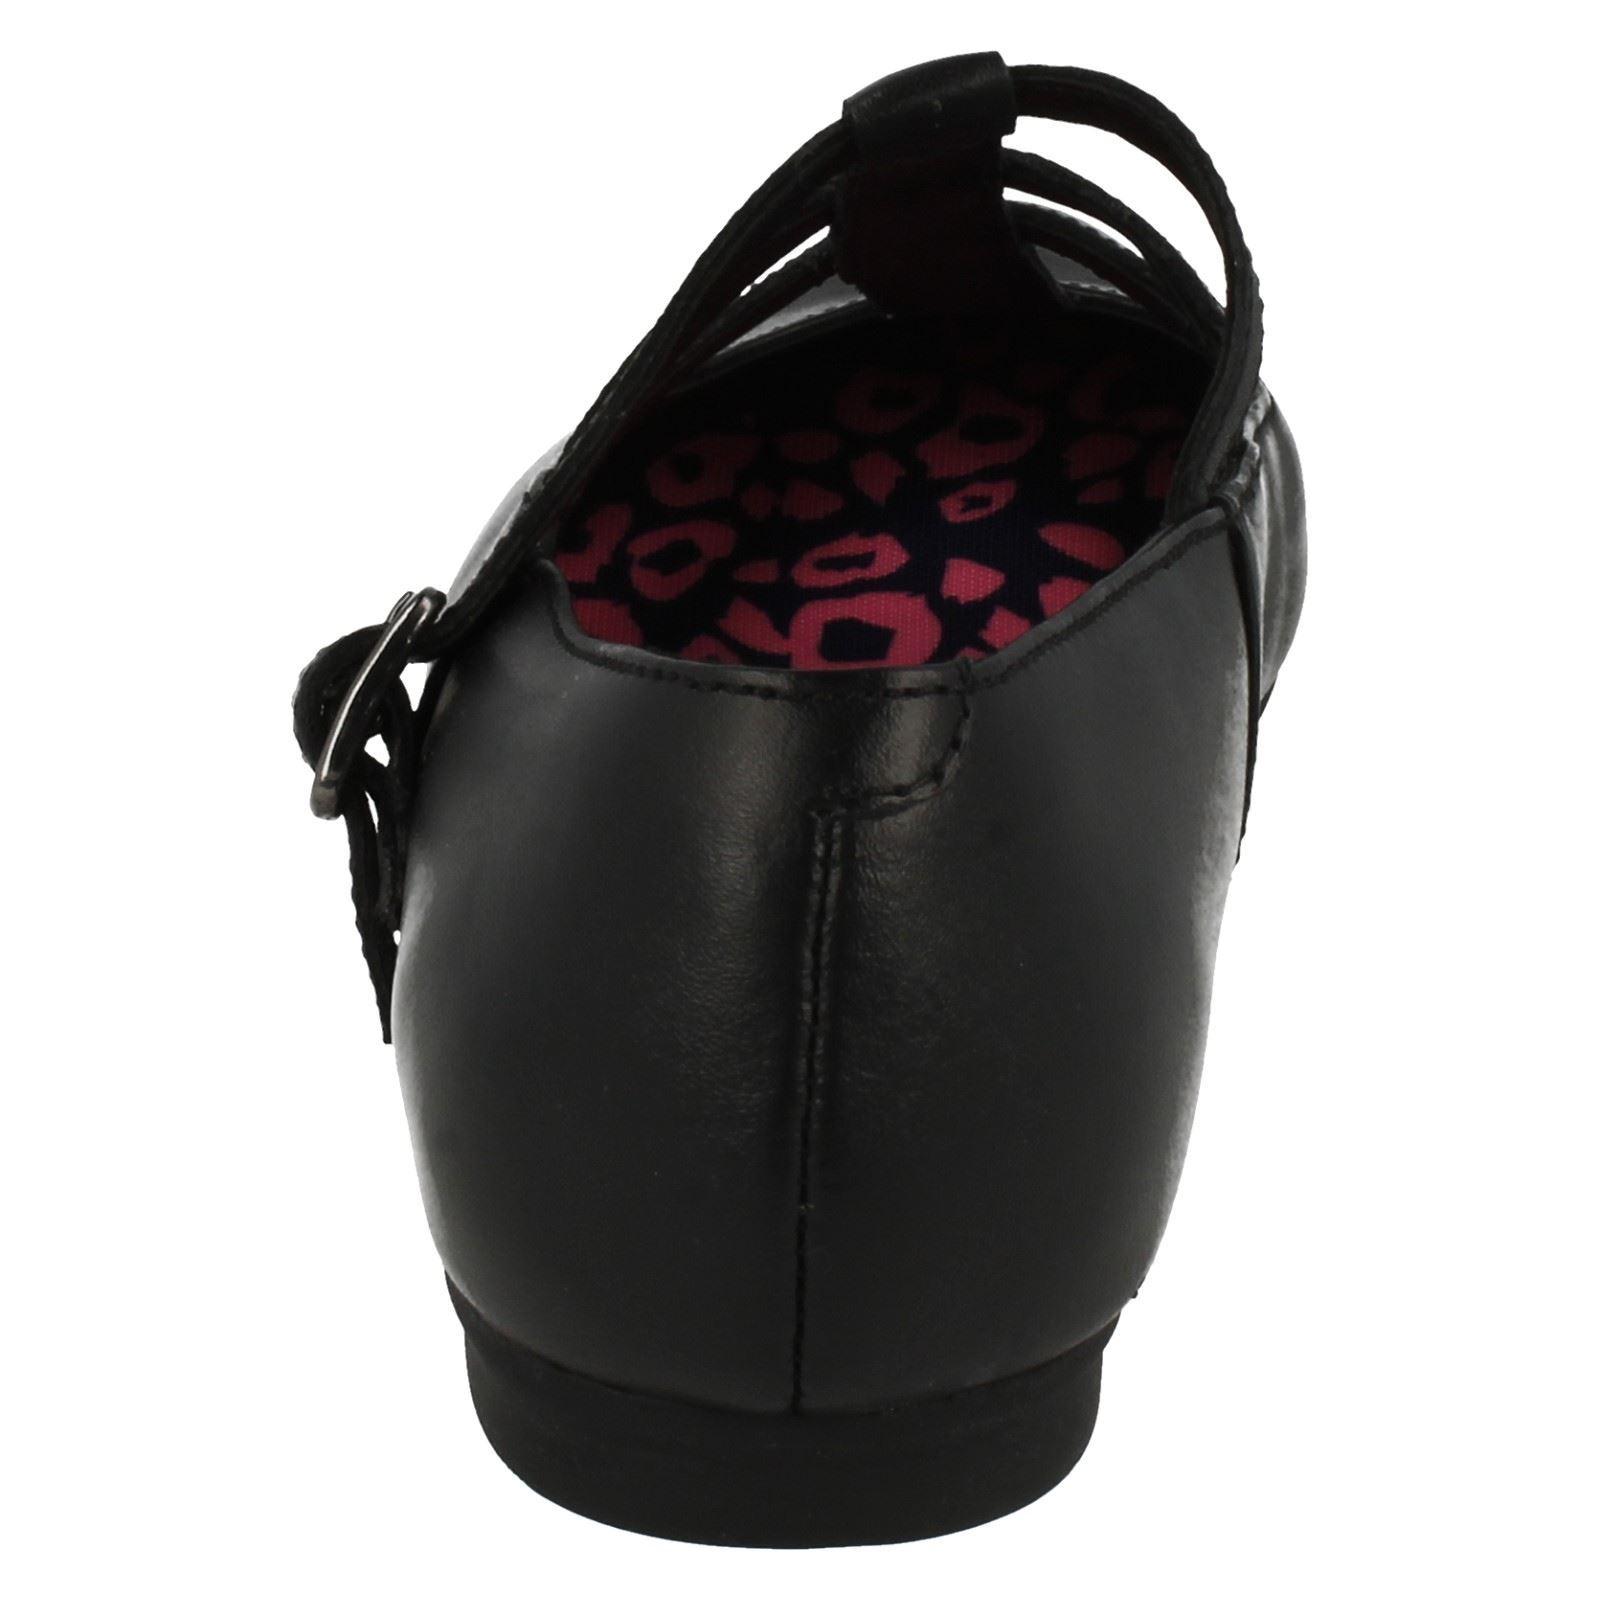 Bl Bootleg mayores Por Quartzflash Niñas Clarks Black Formal School Shoes 6gFWqAx